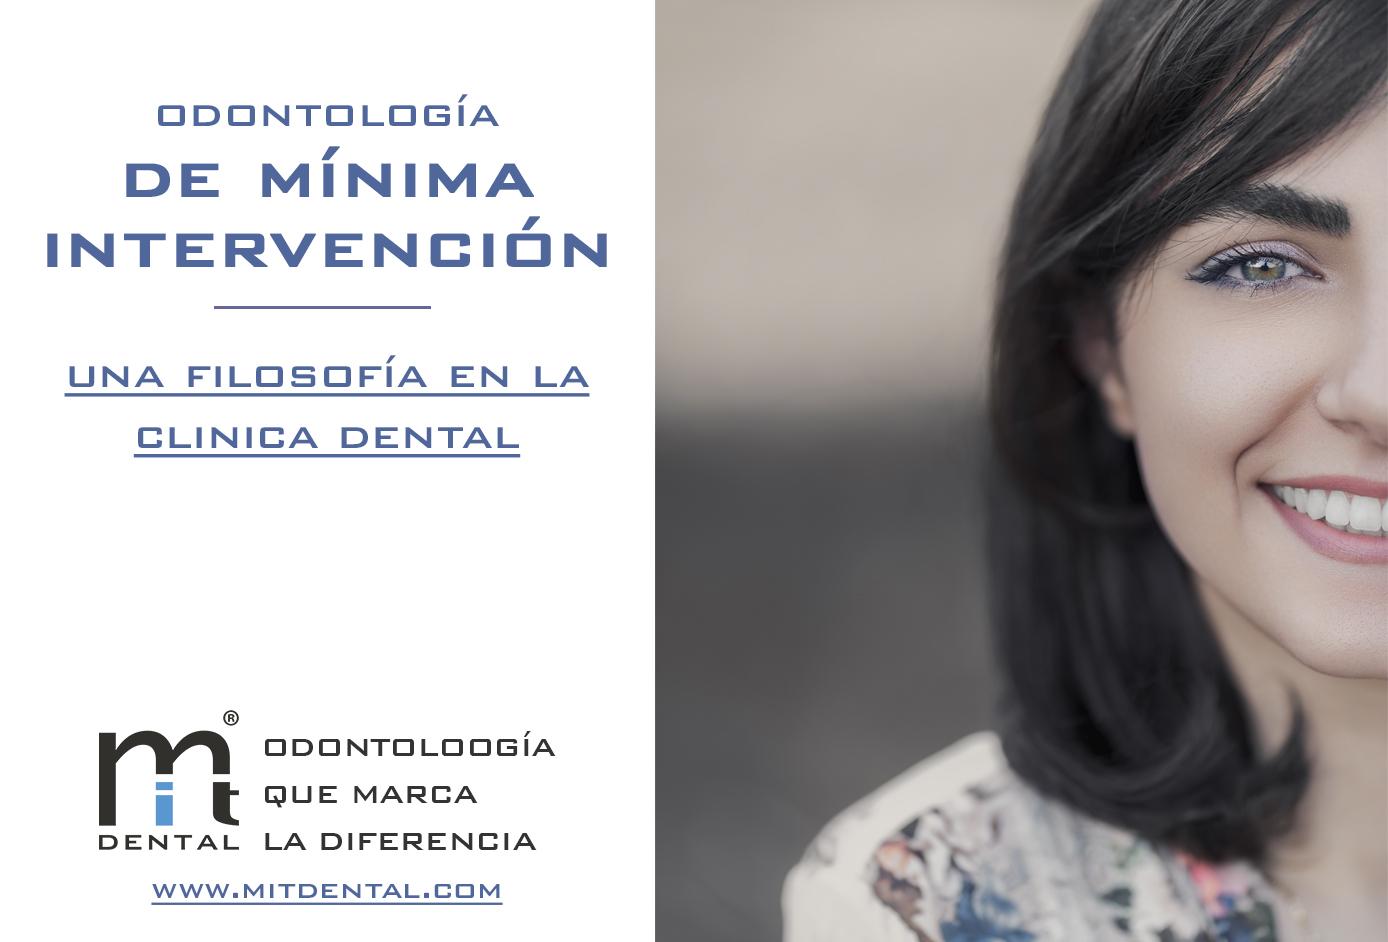 que es la odontologia de minima intervencion